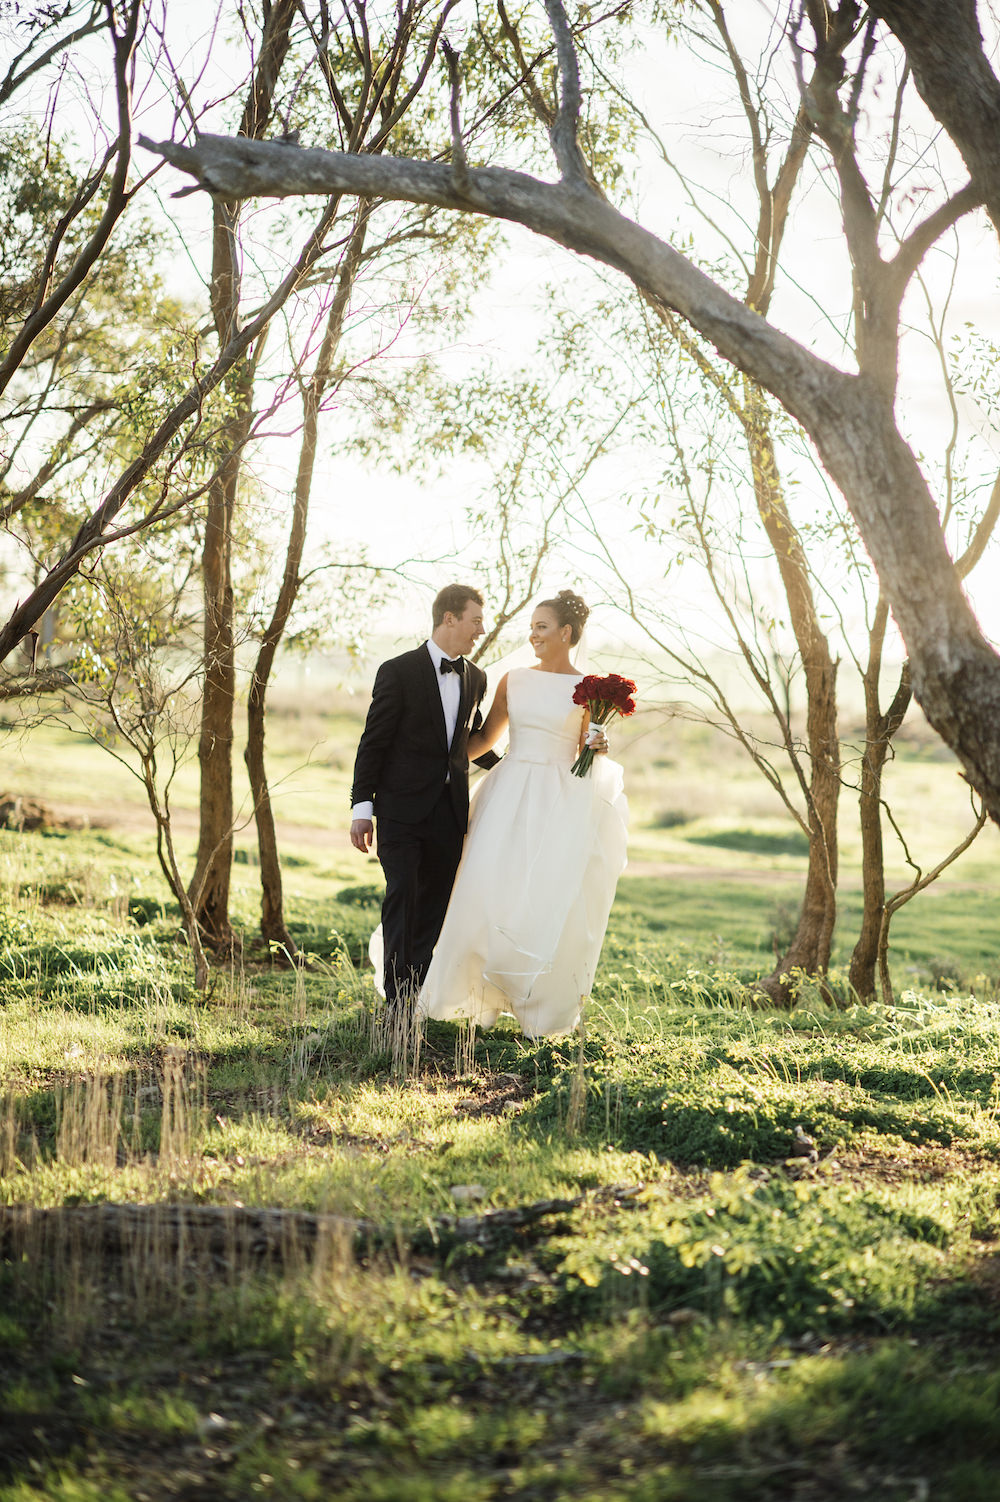 lindahamish-wedding-426.JPG